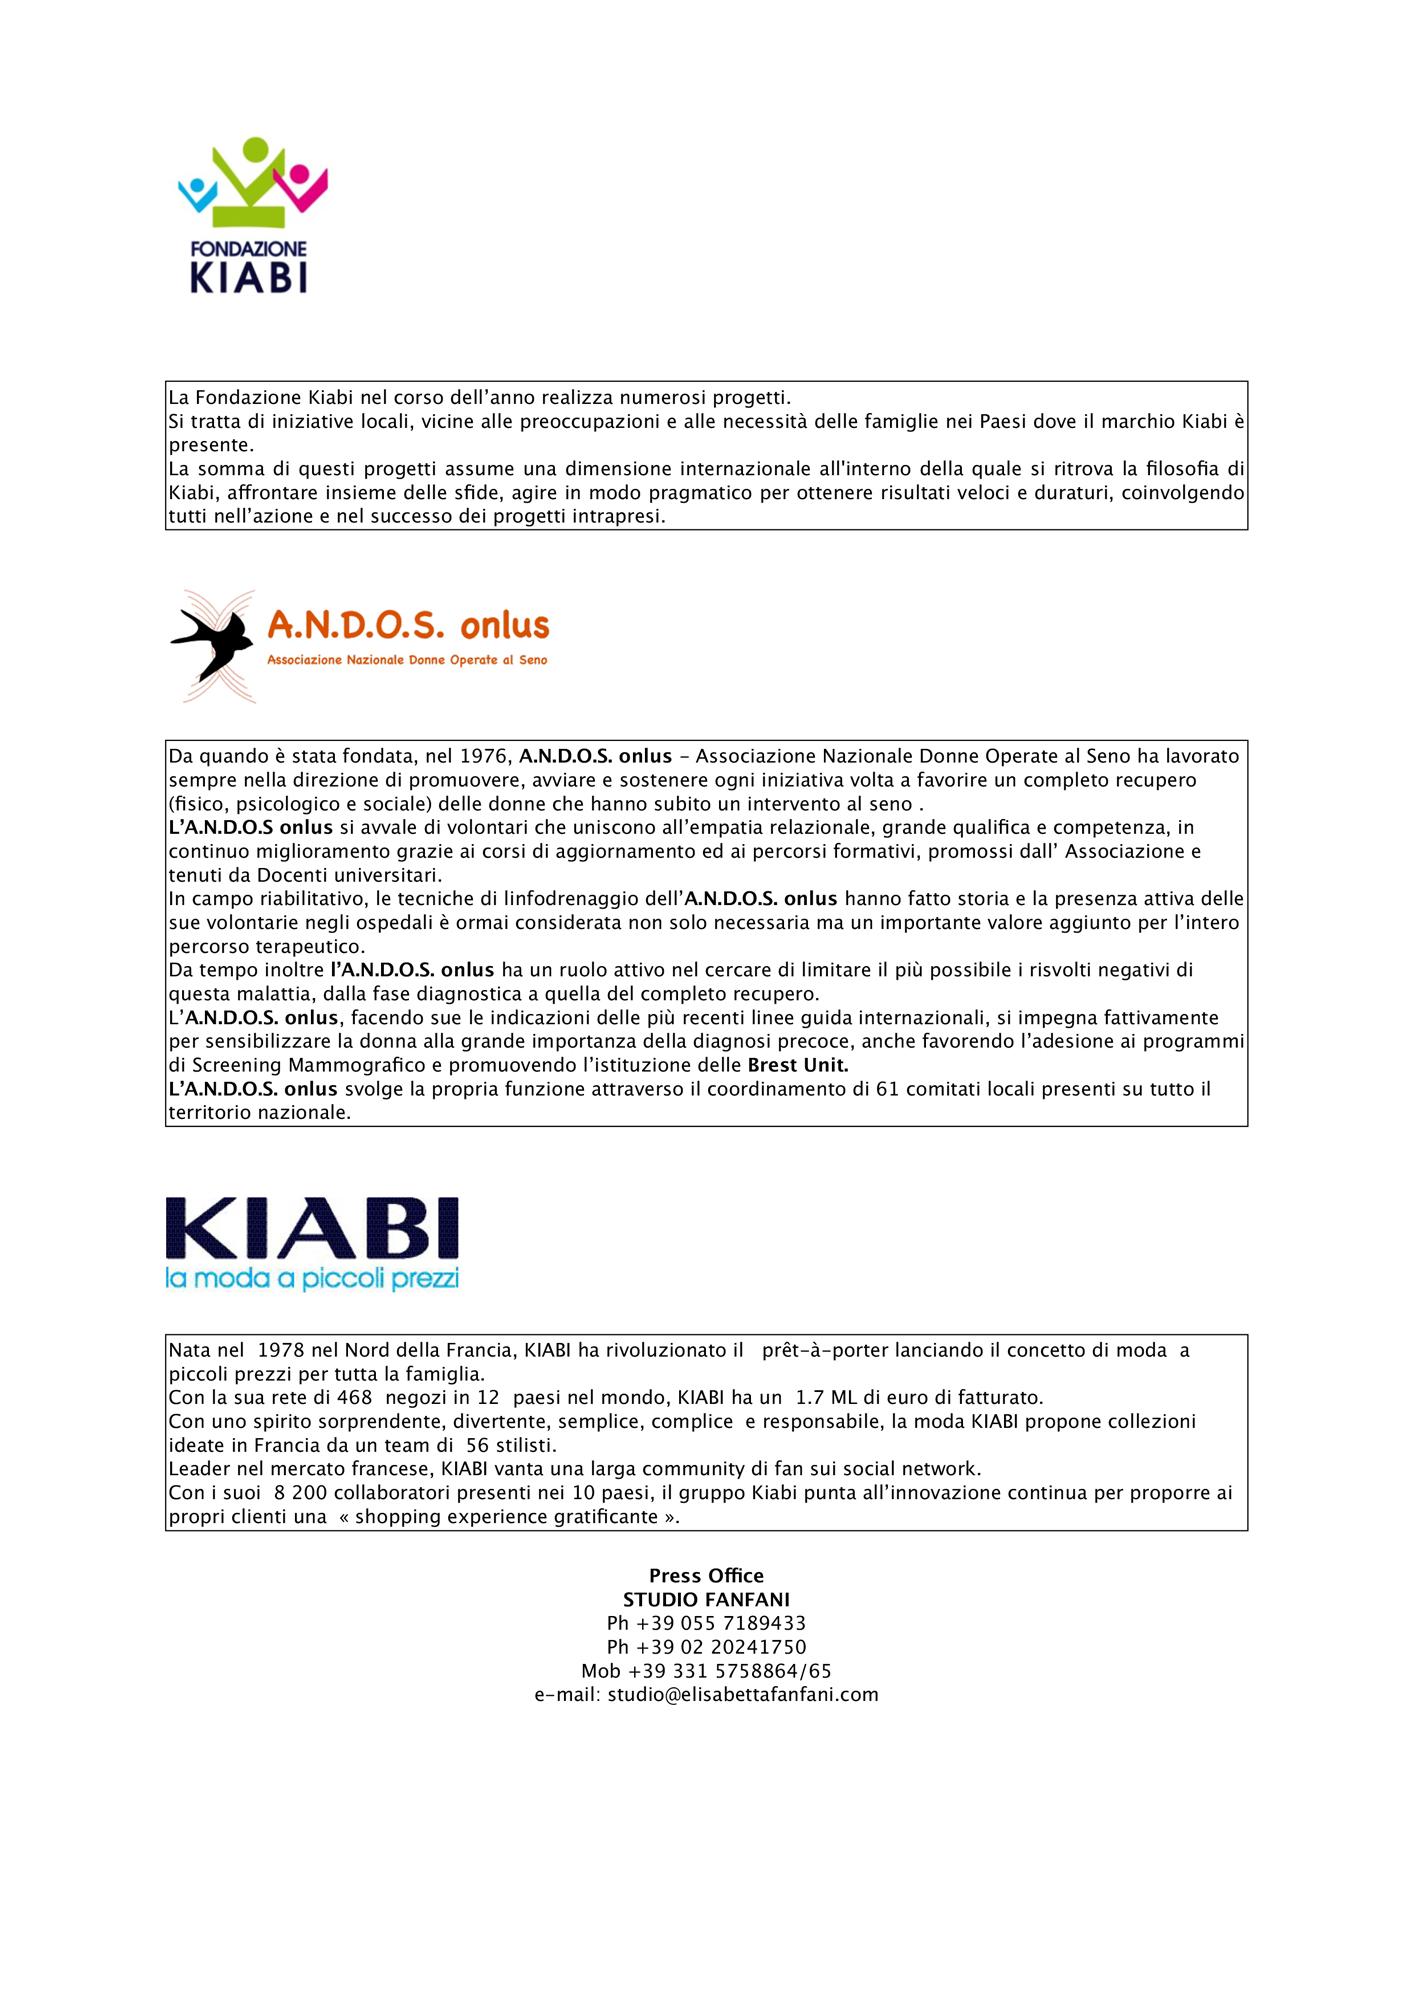 3368bbda04ef OTTOBRE ROSA: ANDOS ONLUS E KIABI DI NUOVO INSIEME - www ...